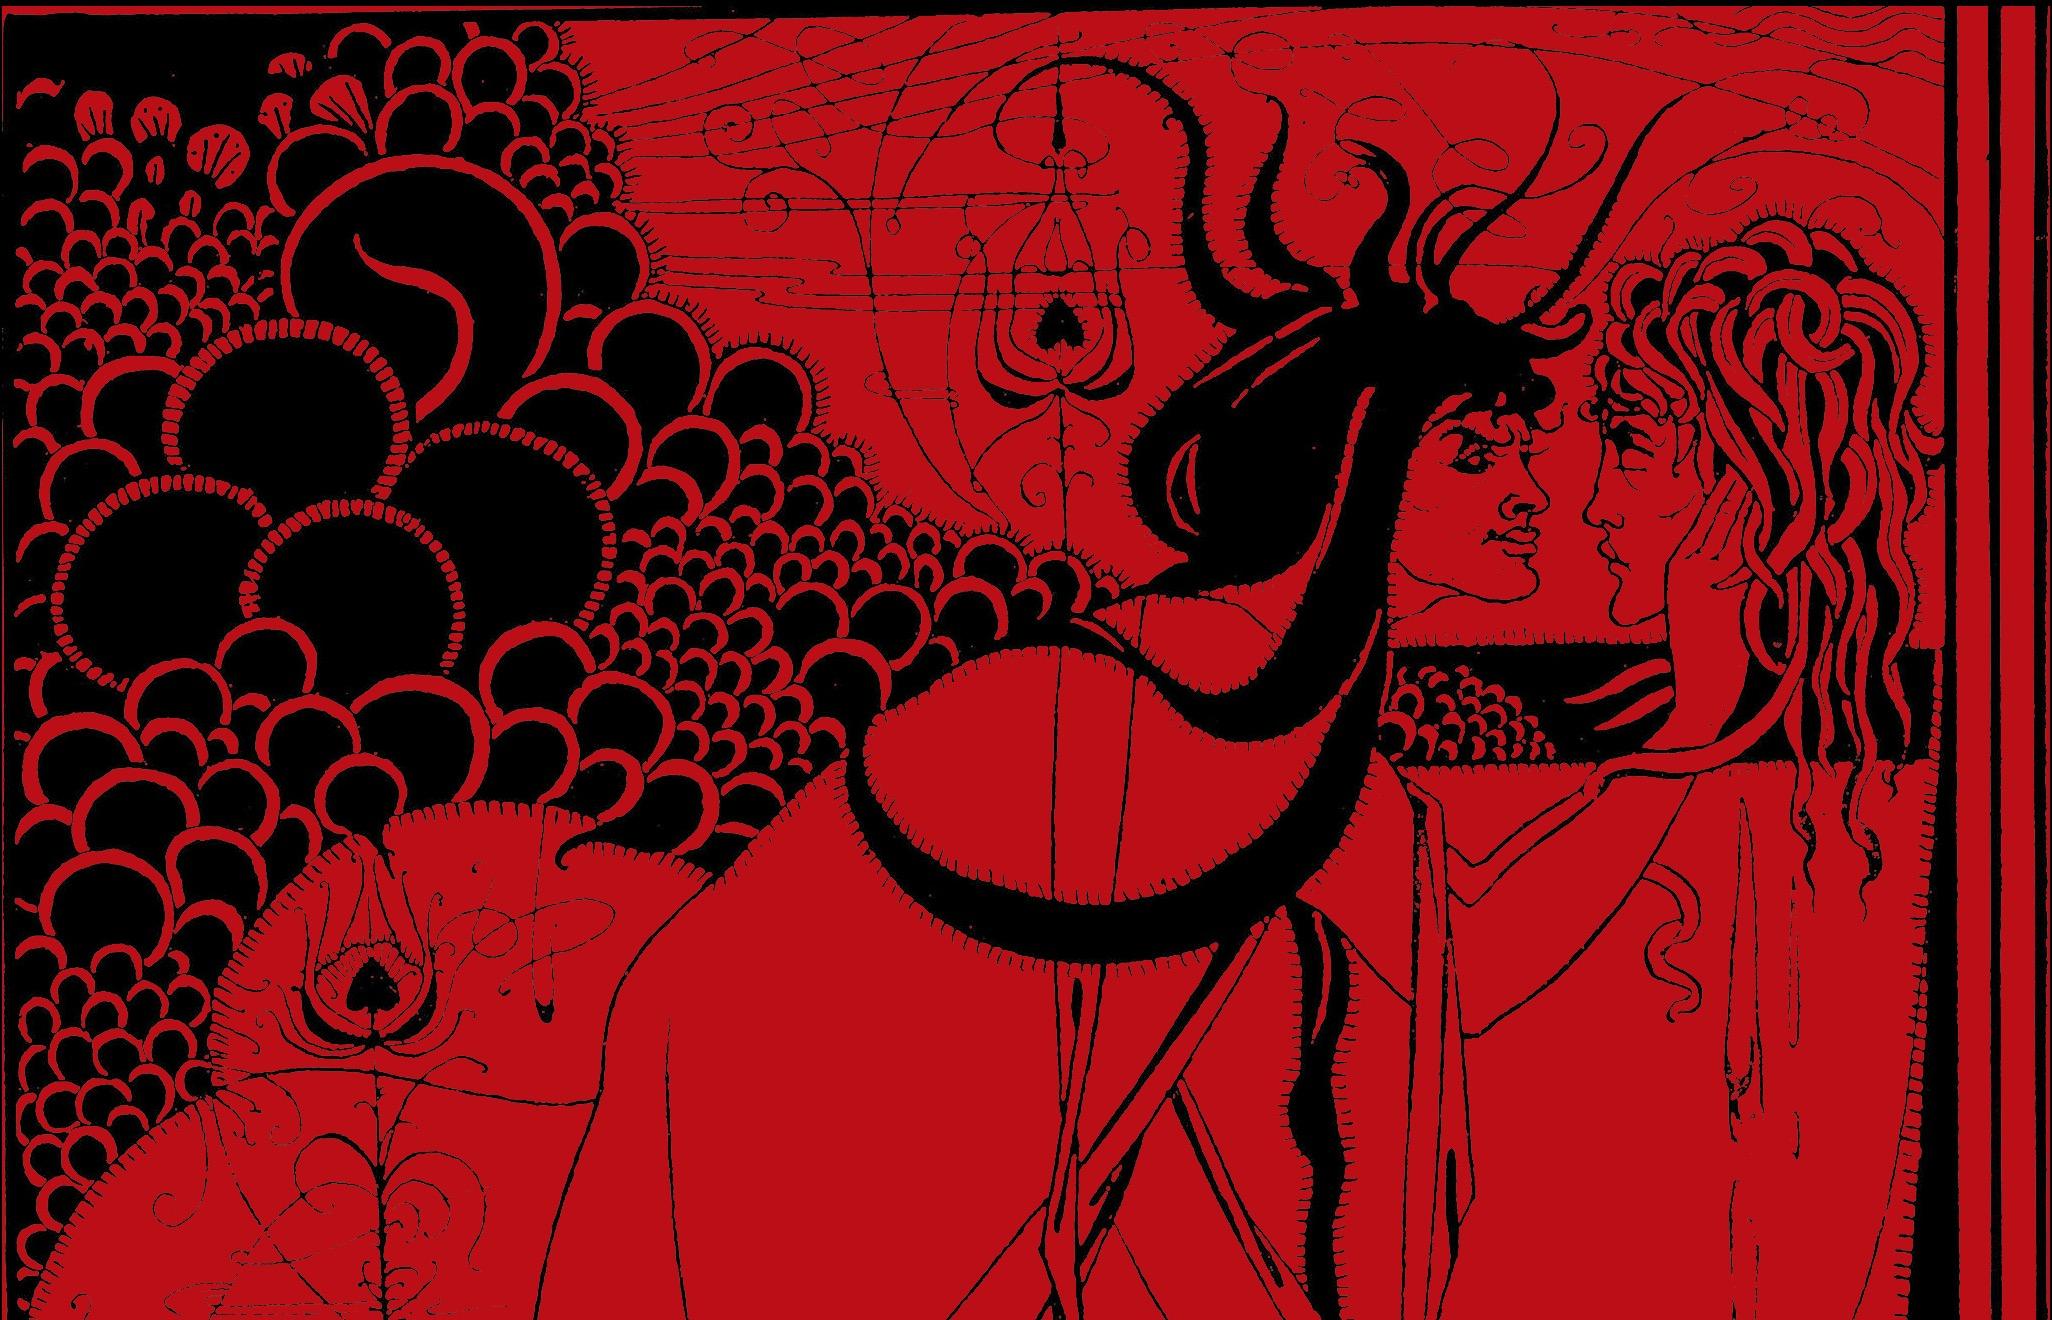 Salome, Richard Strauss, Teatro Regio Torino, SalomeTRT, Noseda, Erika Sunnegårdh, Robert Brubaker, Doris Soffel, Tommi Hakala, Enrico Casari